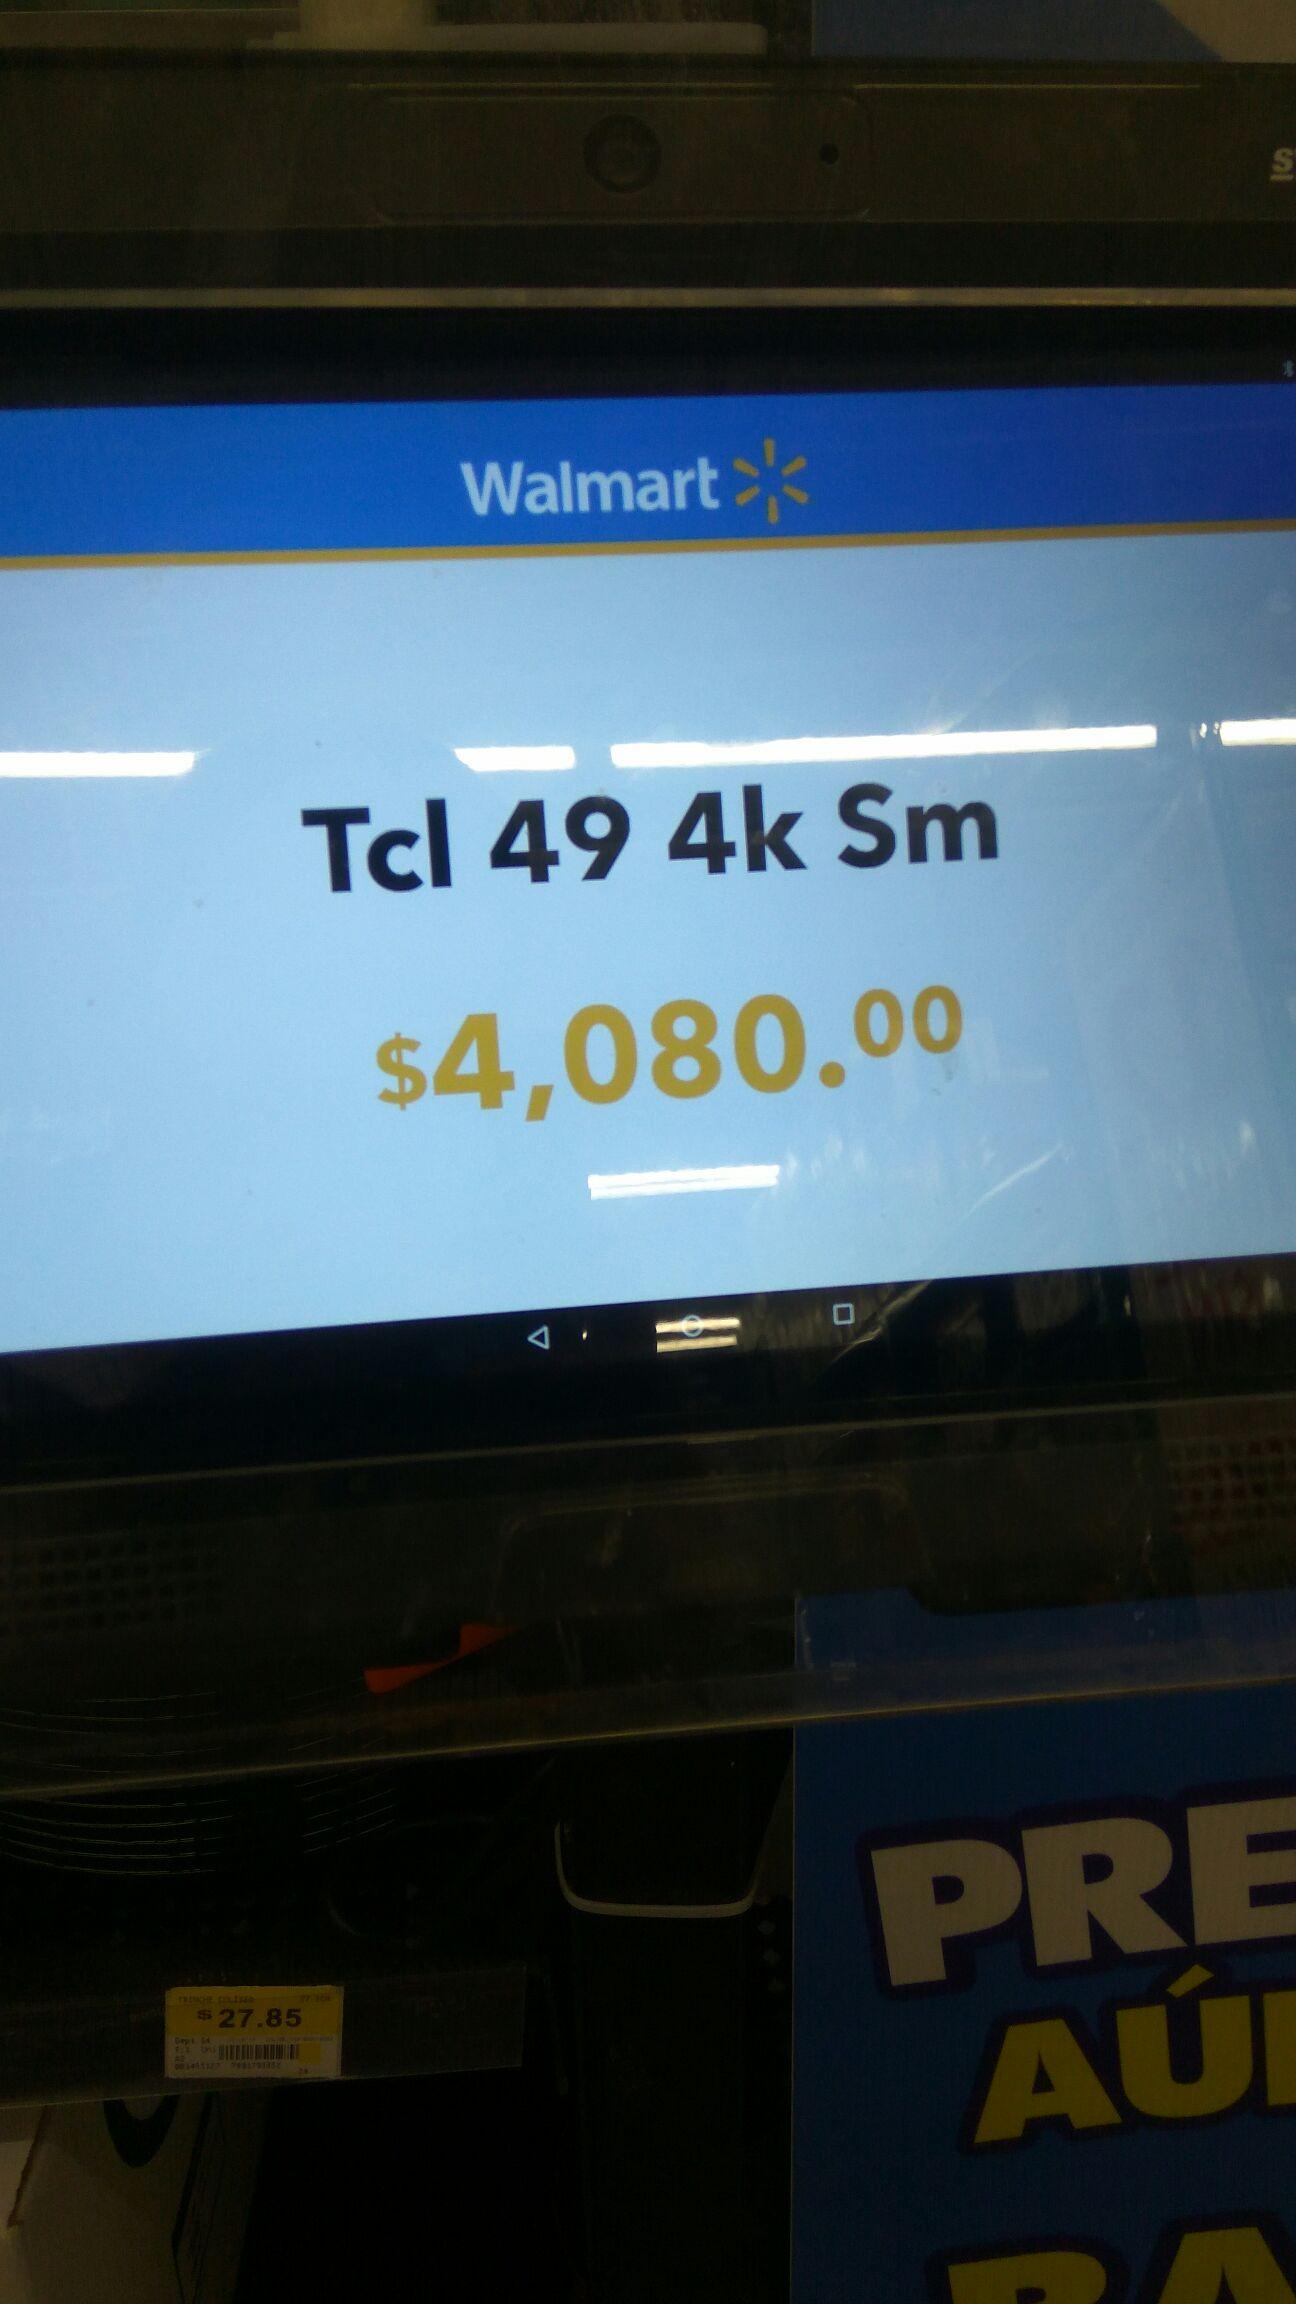 "Walmart CD Juárez Monumental: Pantalla Tcl 49"" 4k Smart TV"